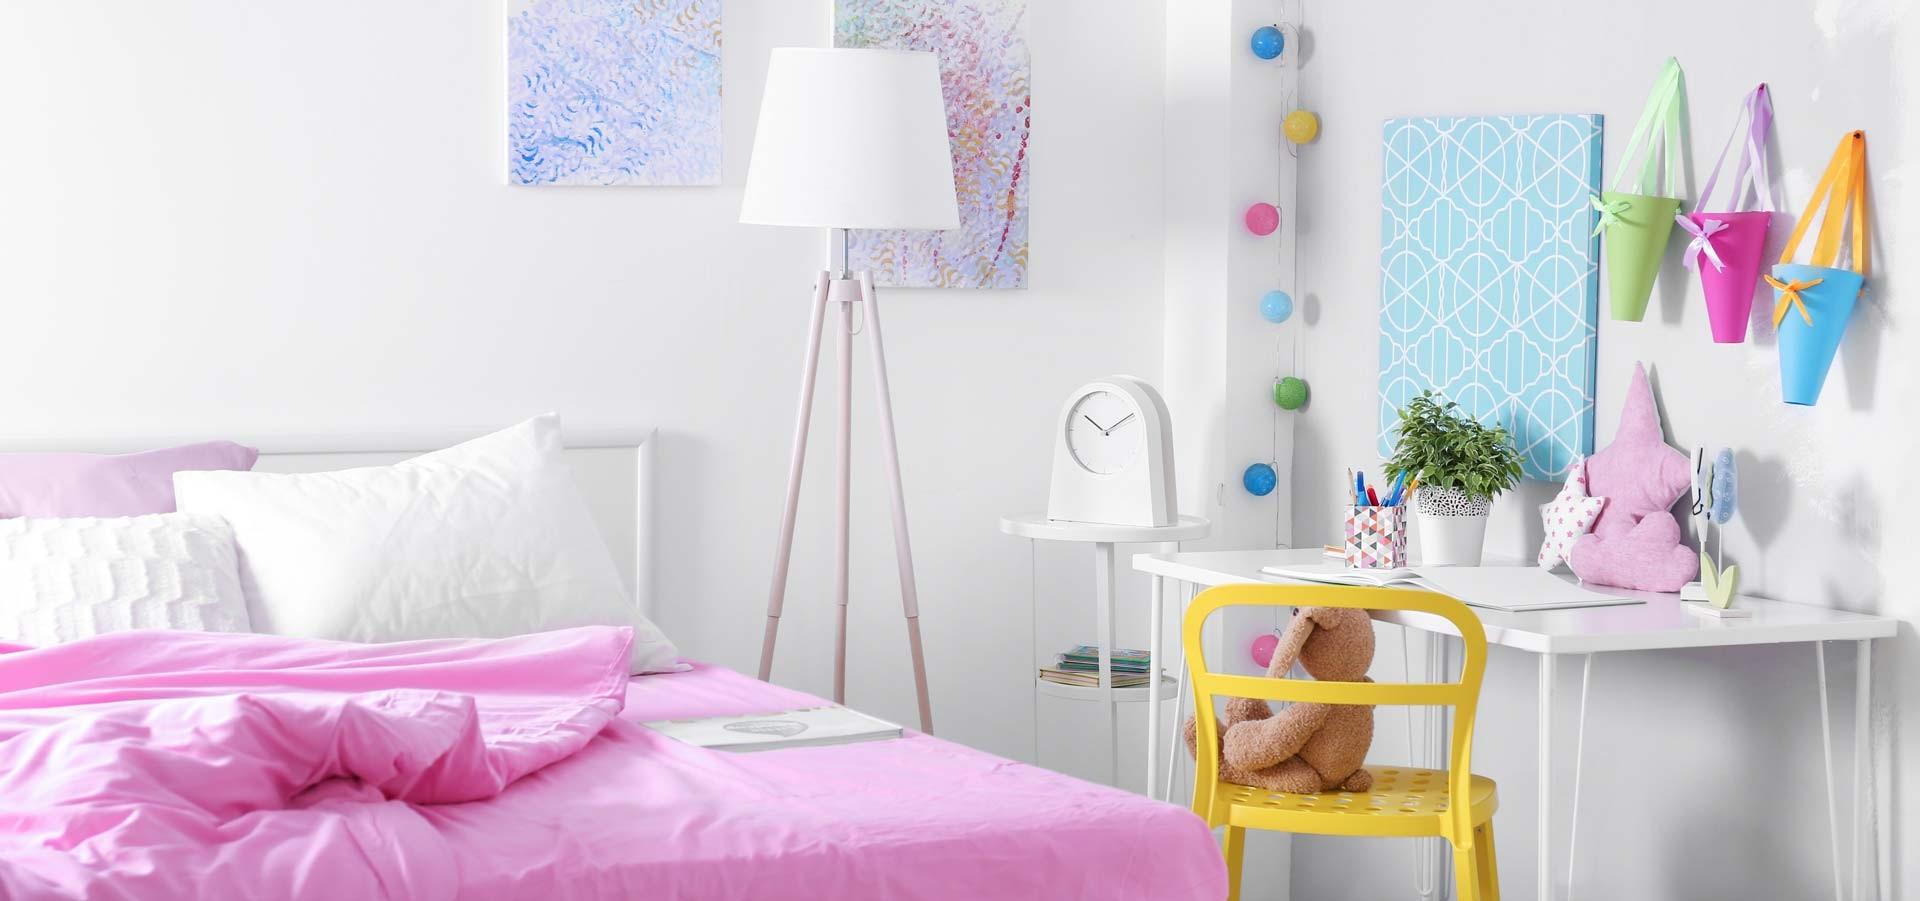 Muebles madrid habitaciones juveniles dormitorios - Muebles anos 50 madrid ...